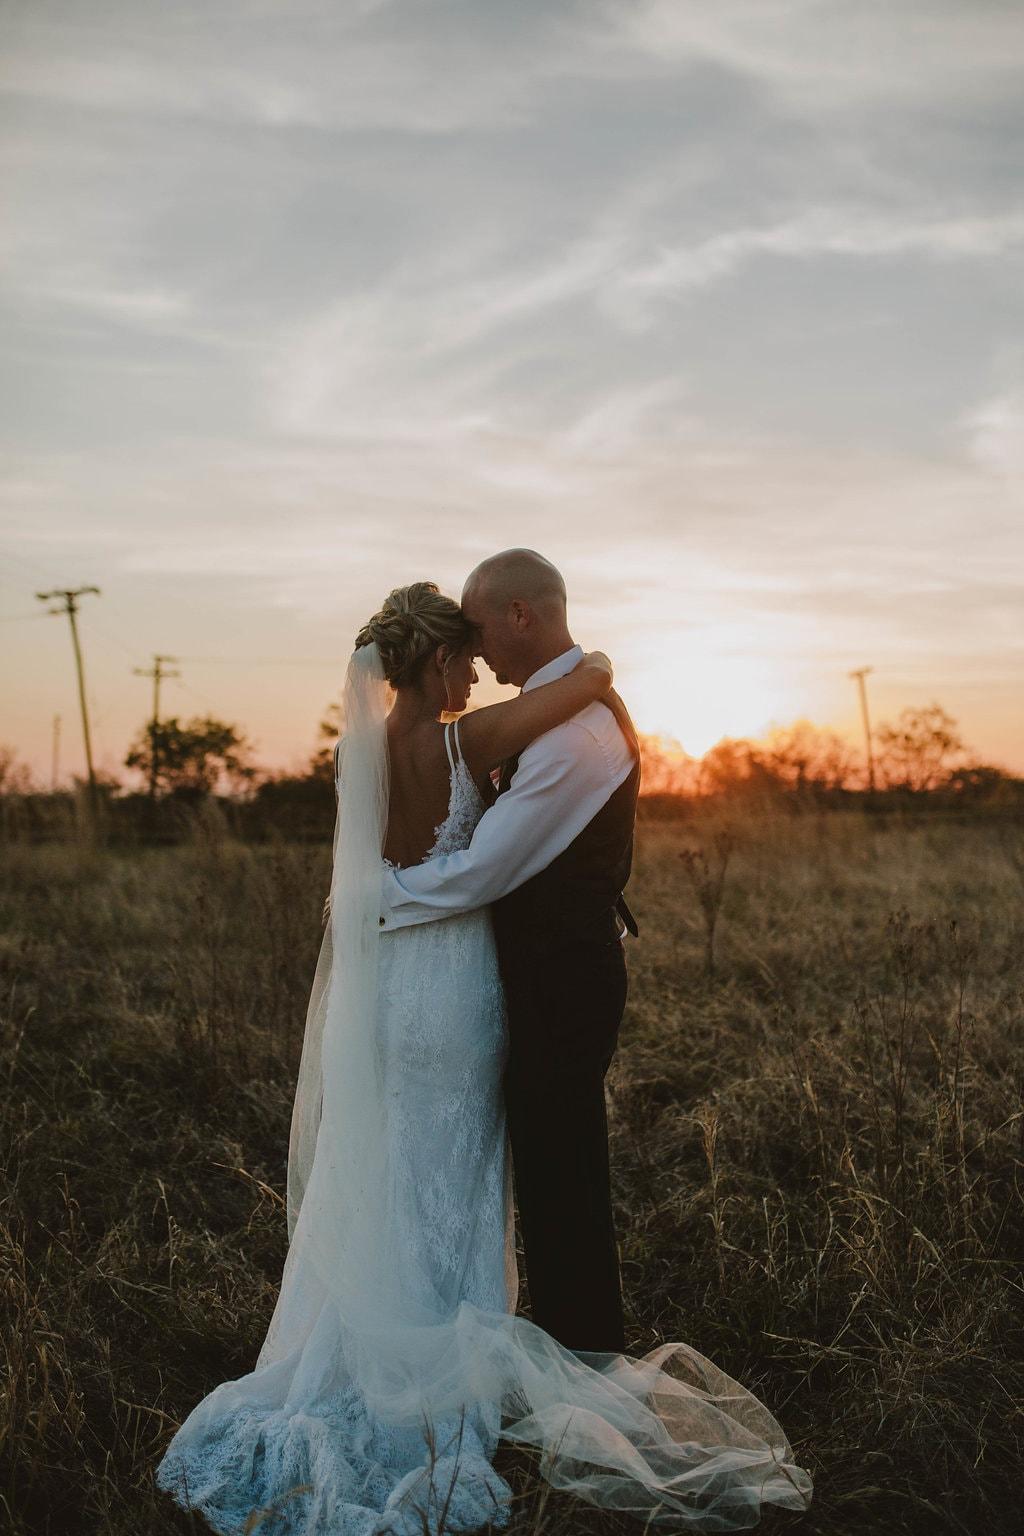 Sunset Portrait of Bride & Groom | Image: Jessica J Photography